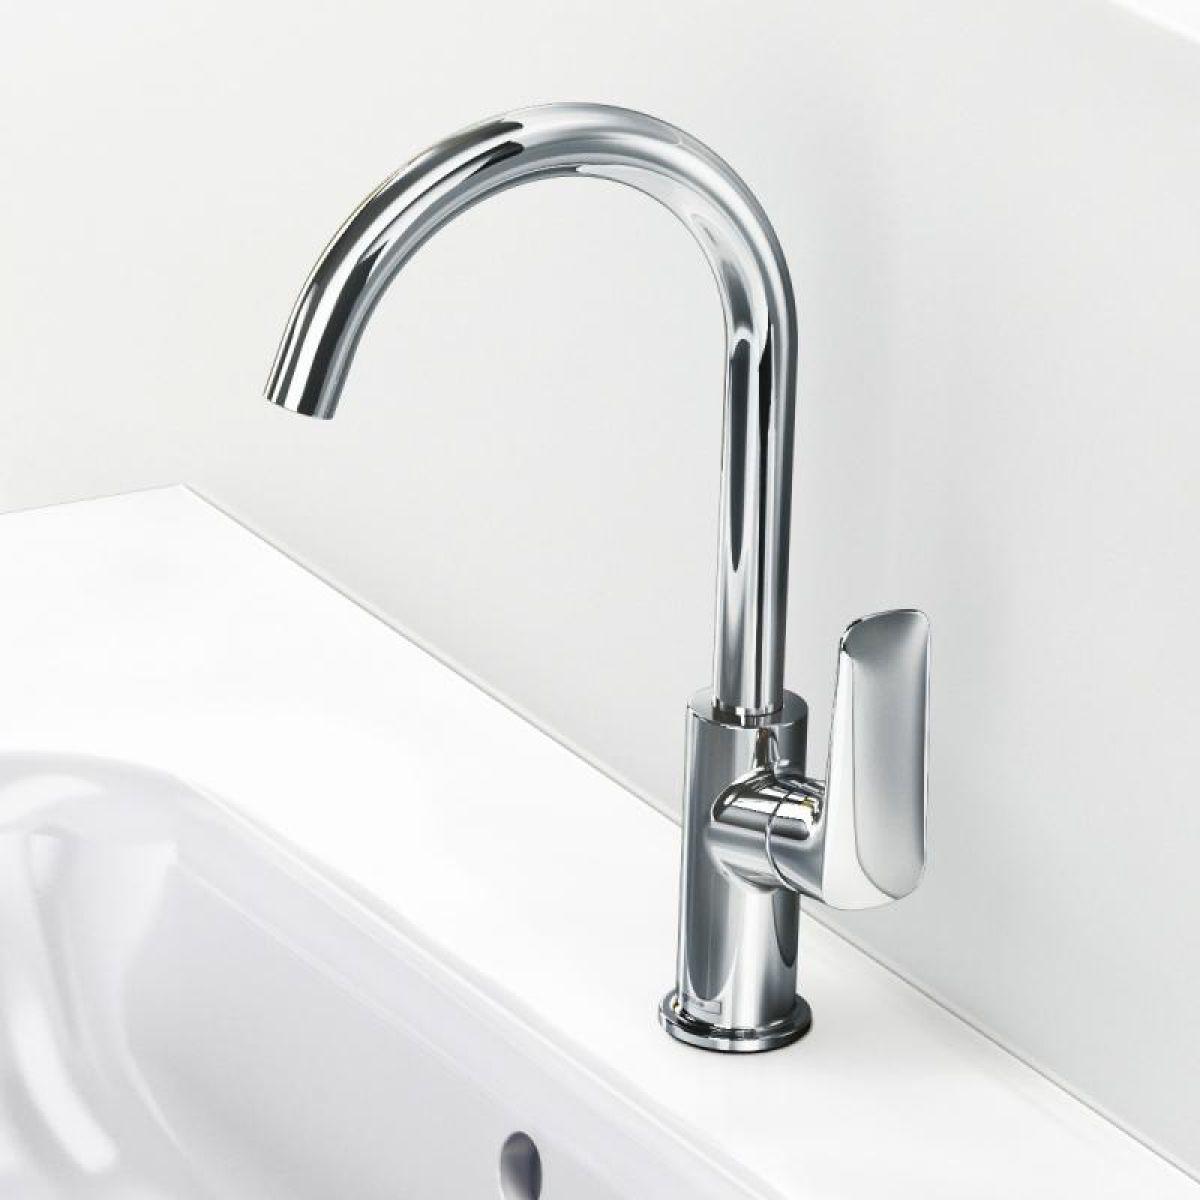 hansgrohe logis 210 swivel basin mixer tap uk bathrooms. Black Bedroom Furniture Sets. Home Design Ideas